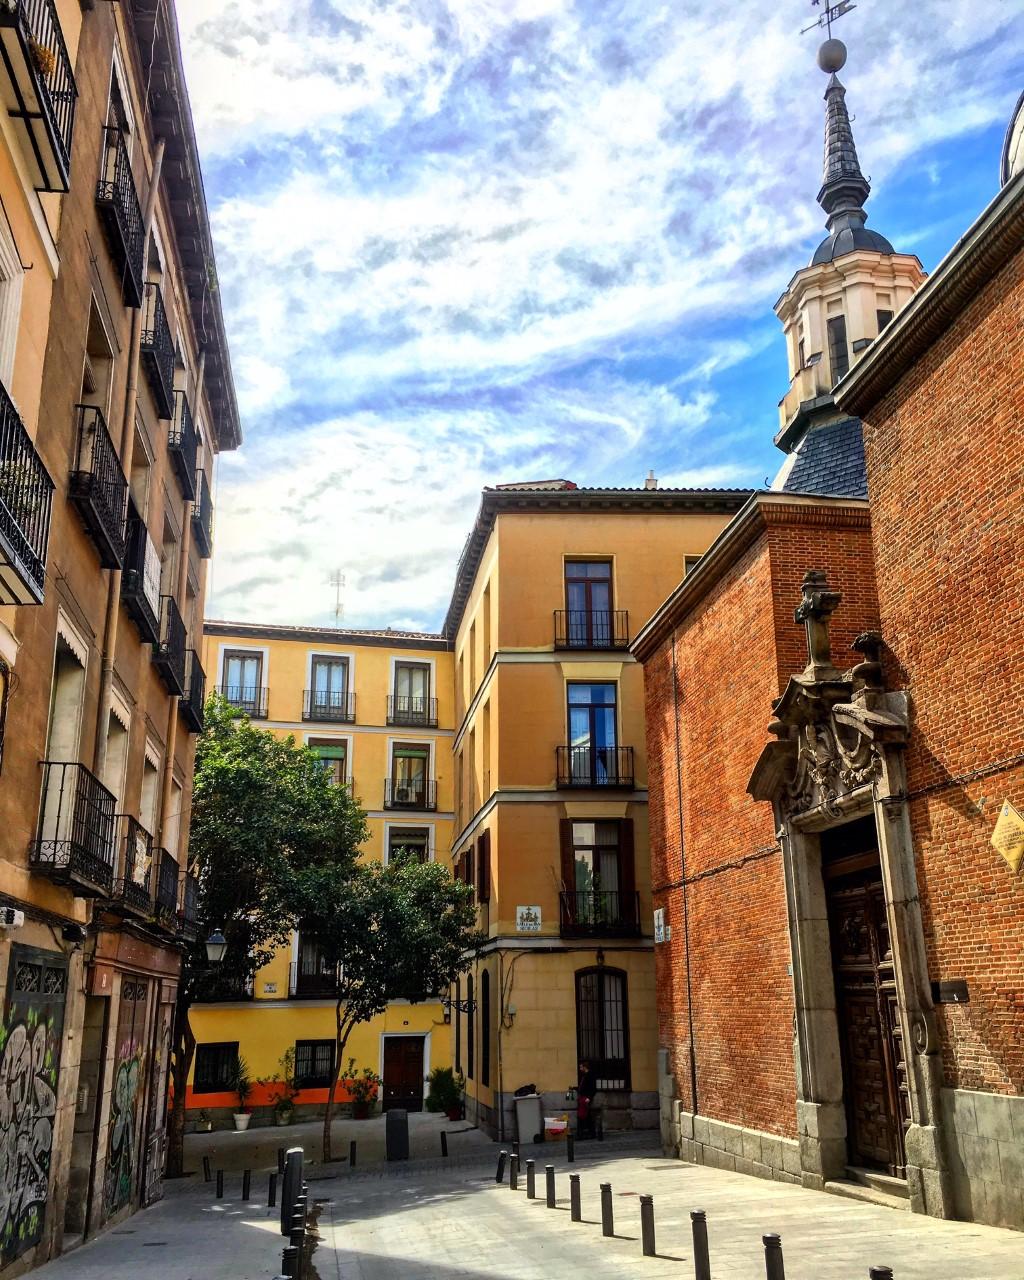 Calle de San Nicolás, Madrid